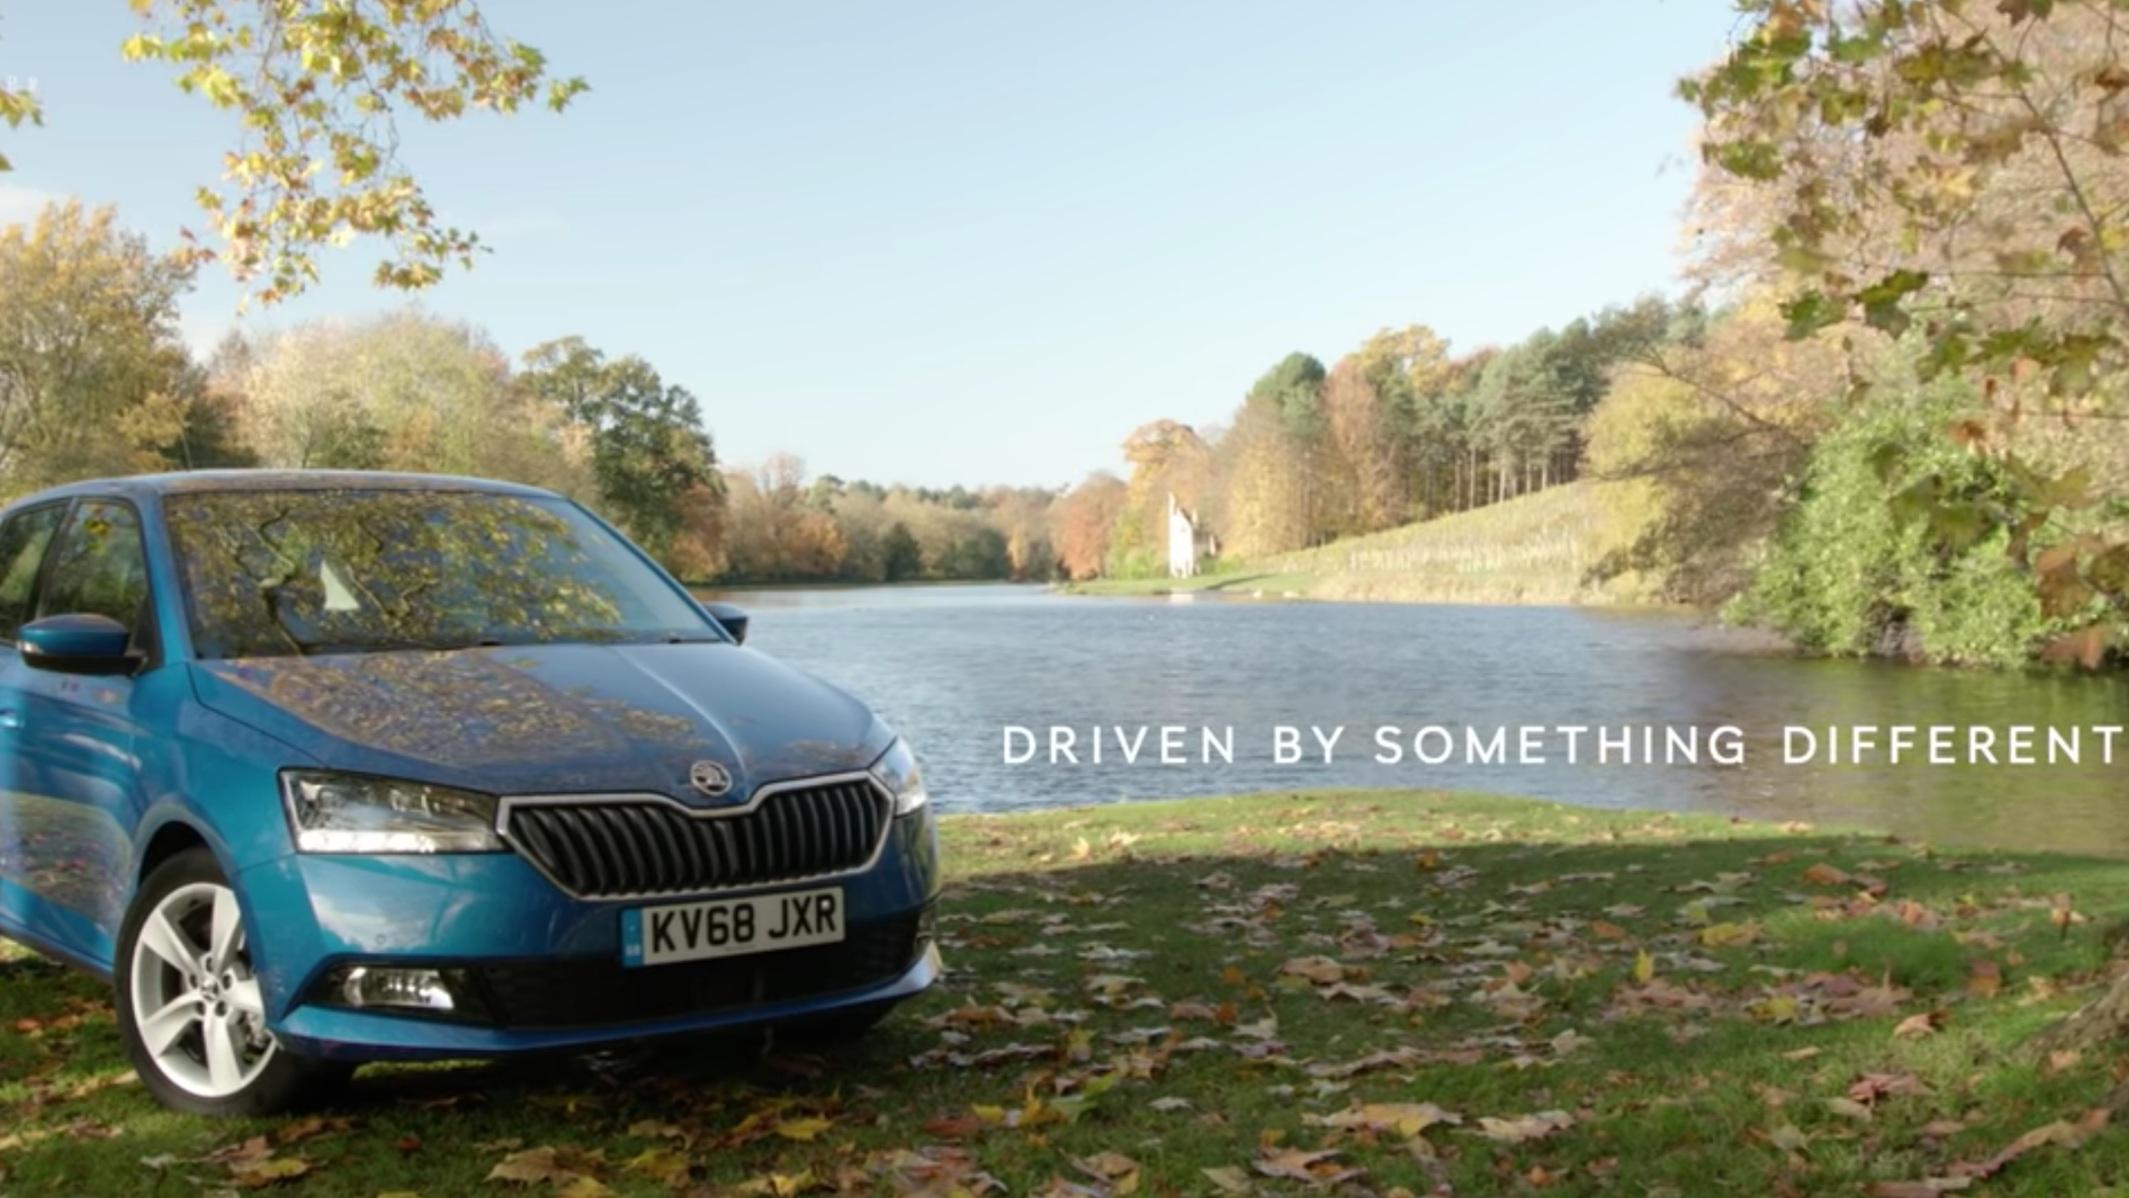 SKODA - WHAT DRIVES BETH